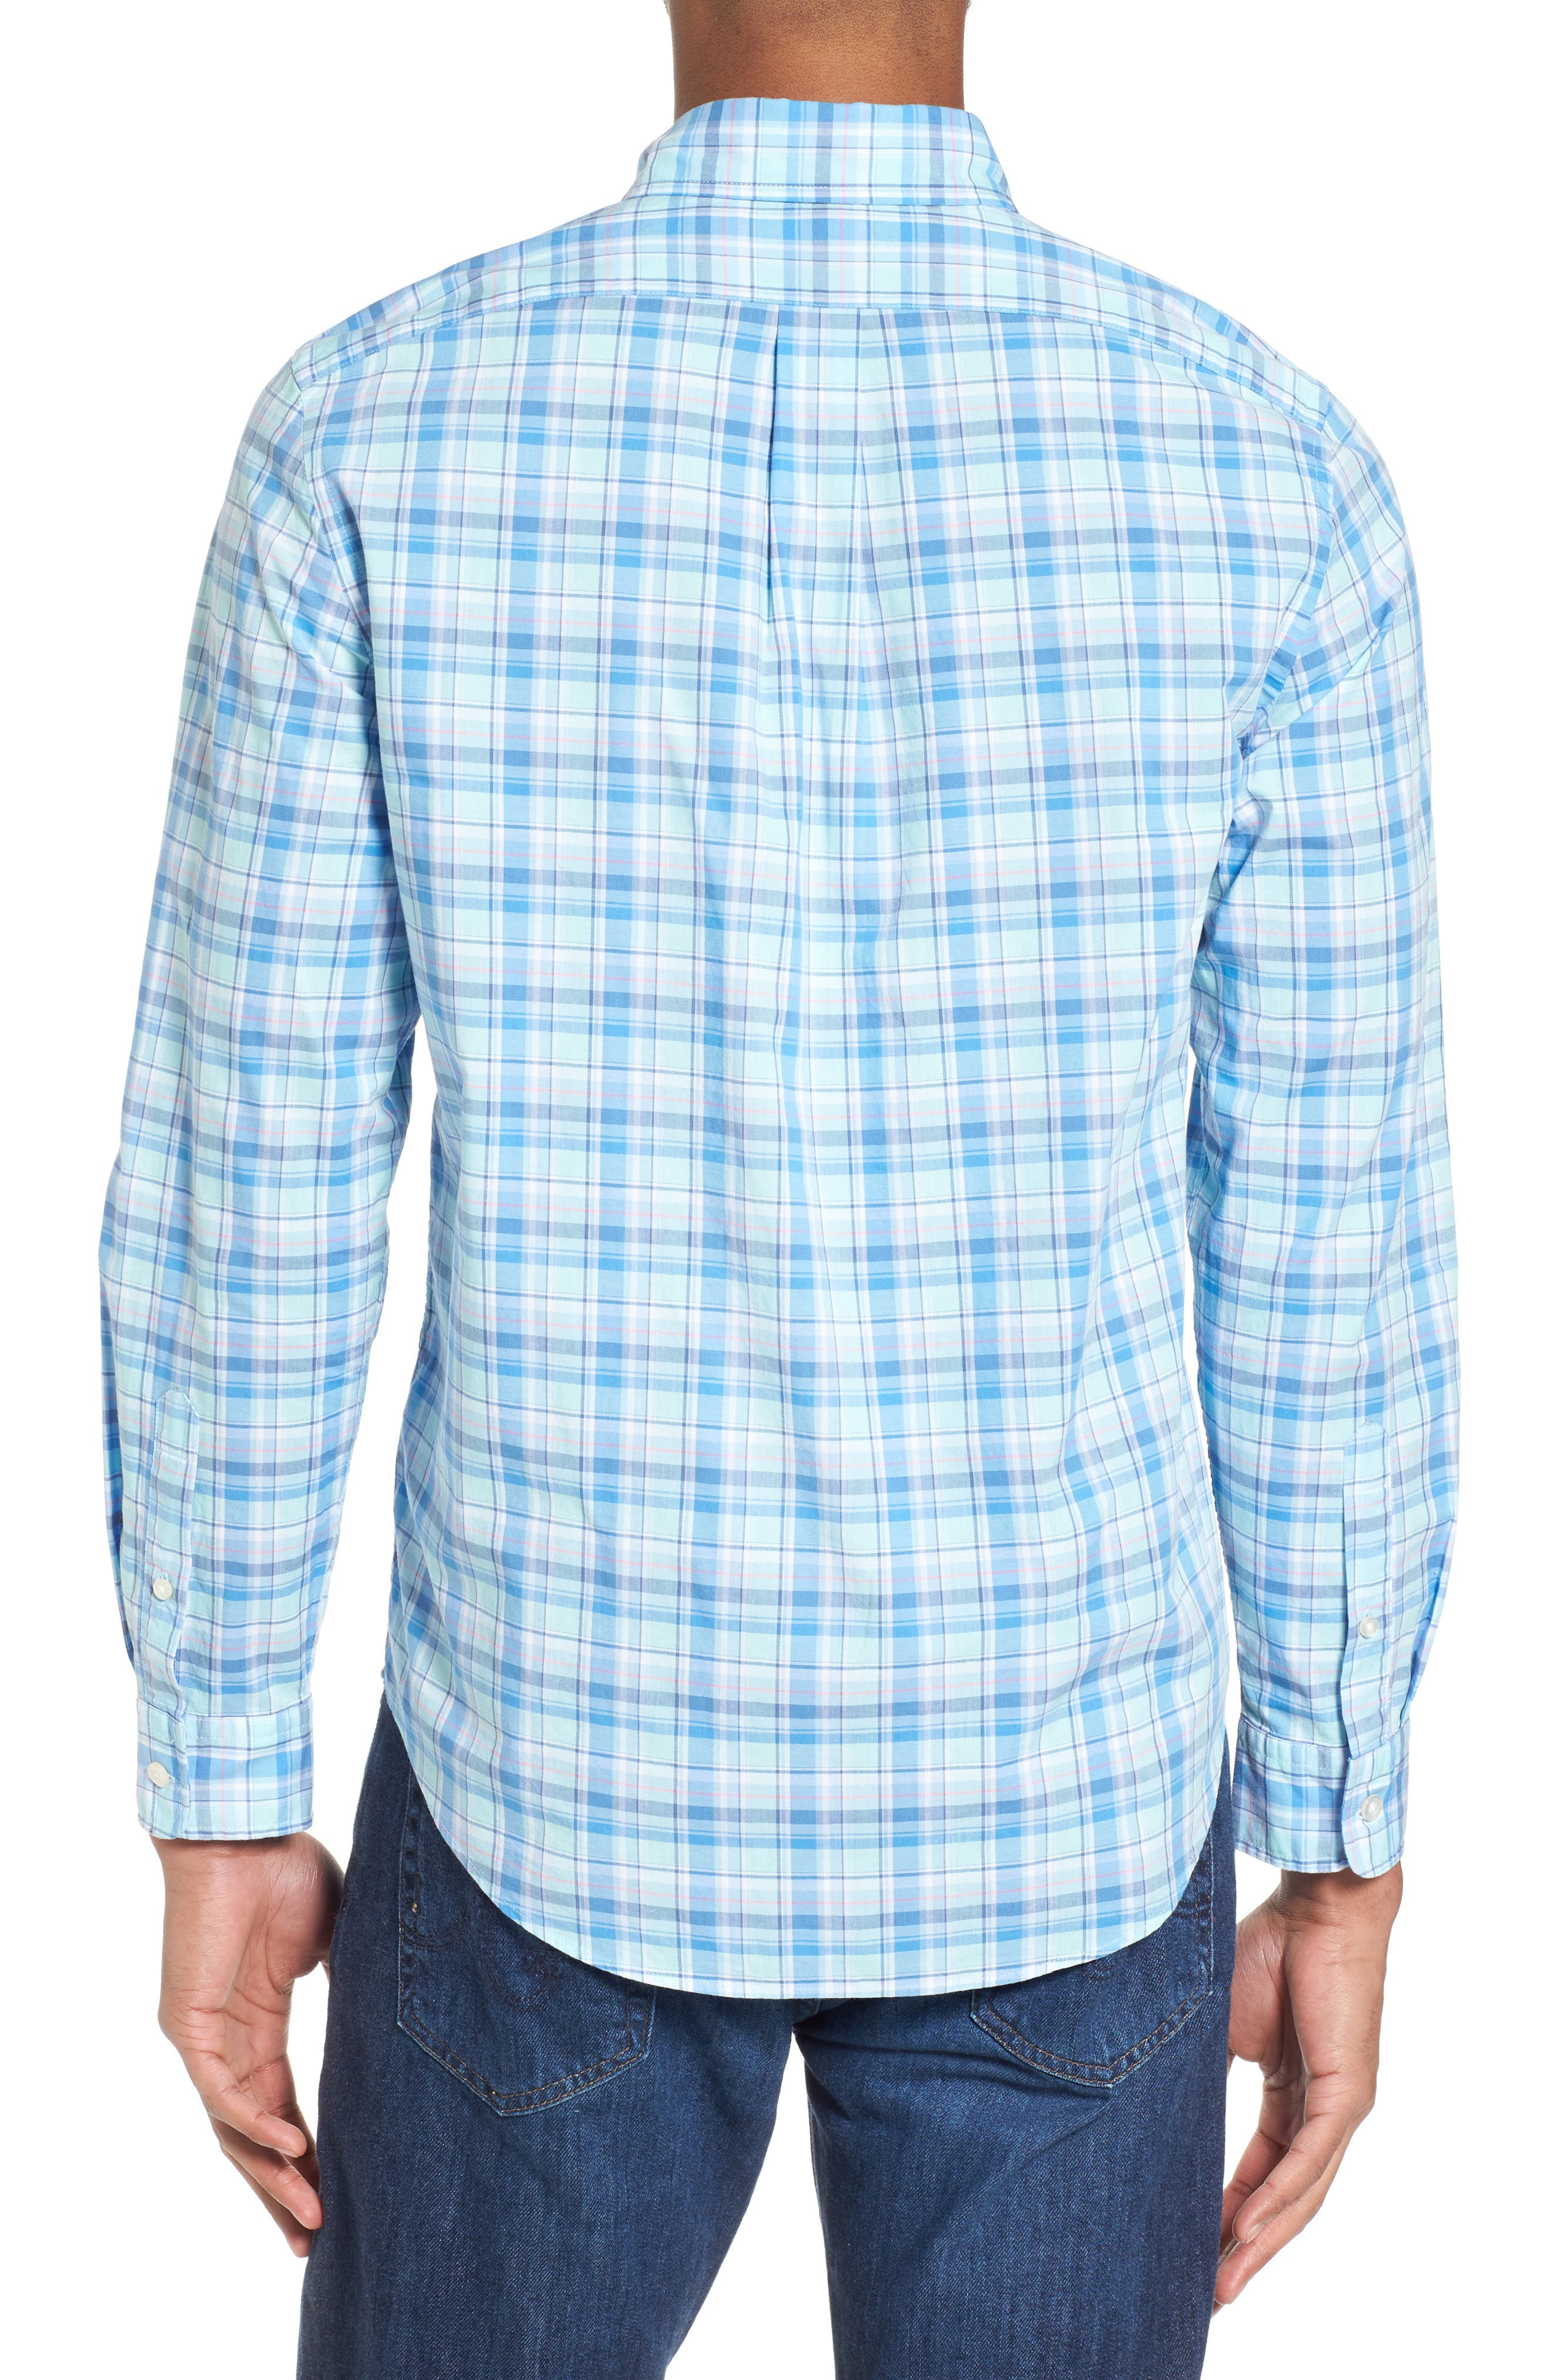 Murray Pine Island Slim Fit Plaid Sport Shirt,                             Alternate thumbnail 2, color,                             422